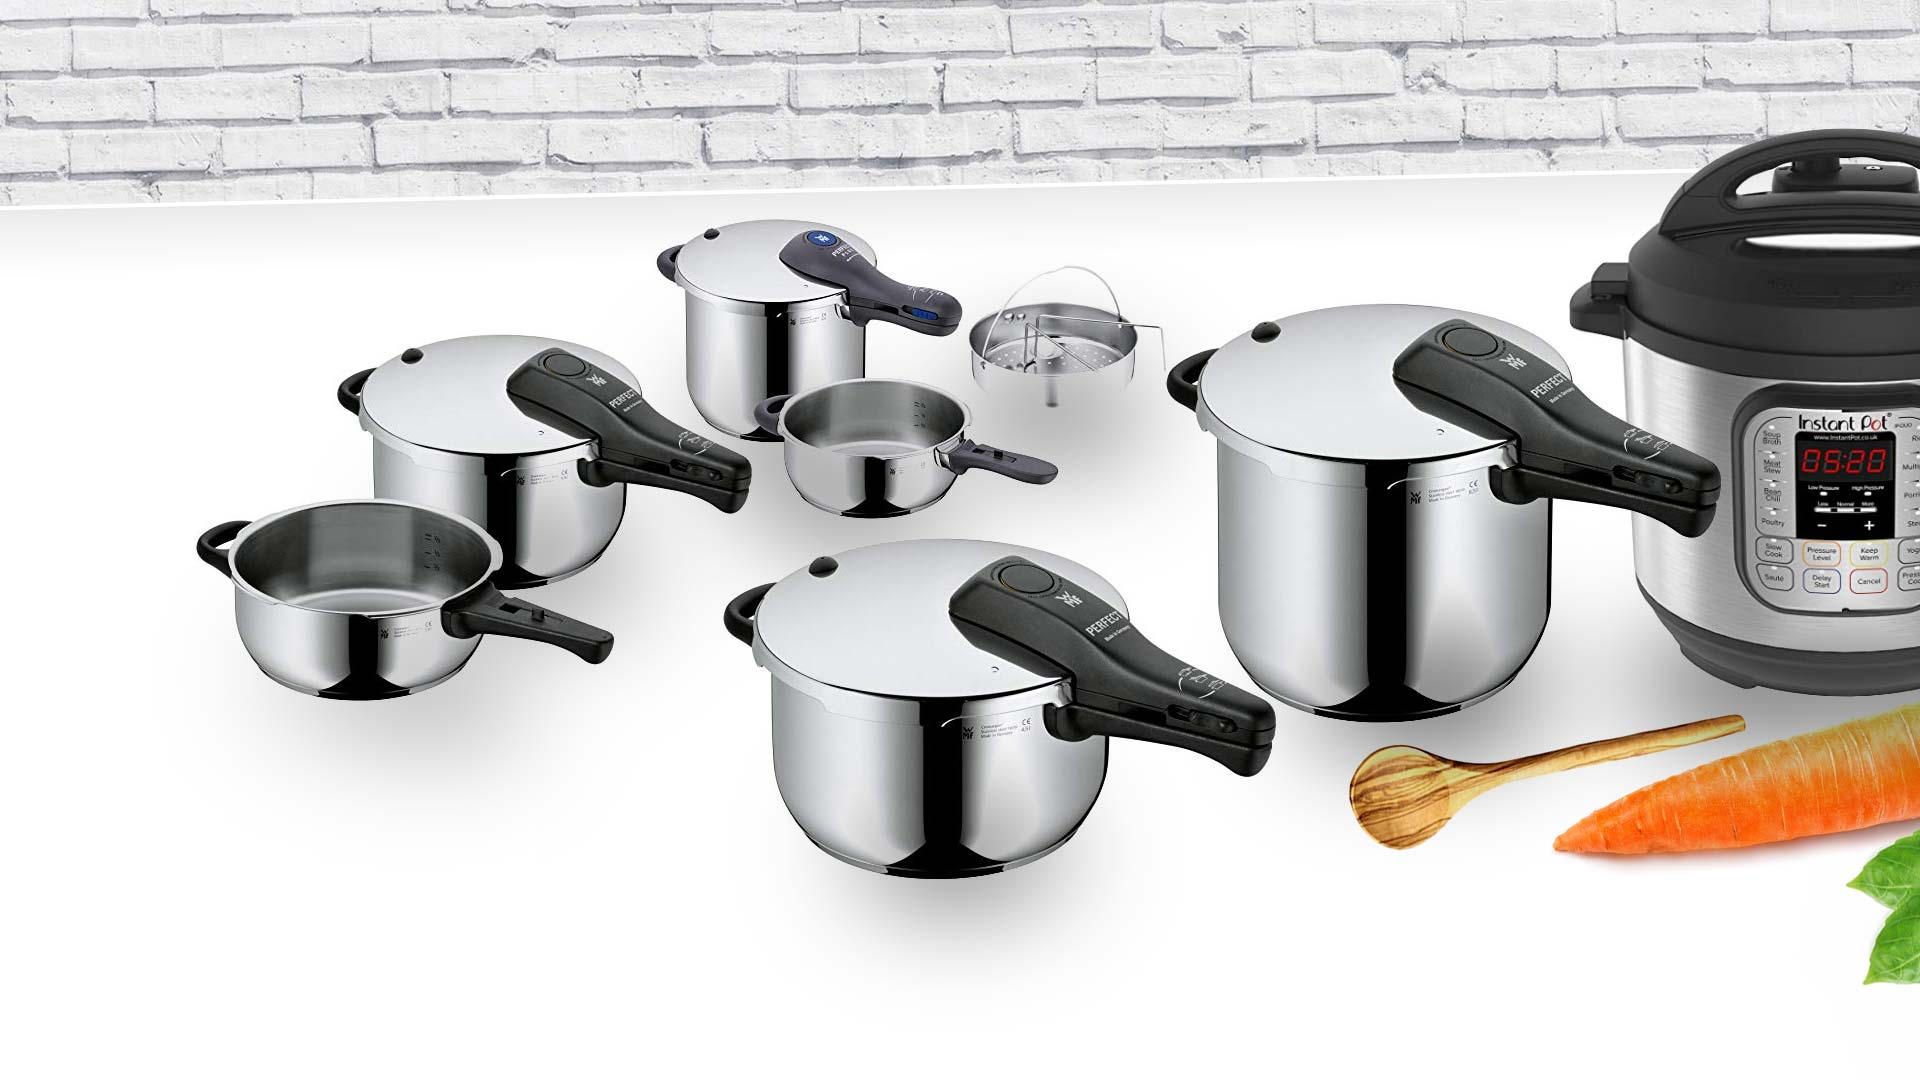 Pressure cooker: advantages, comparison & test winner - save energy!